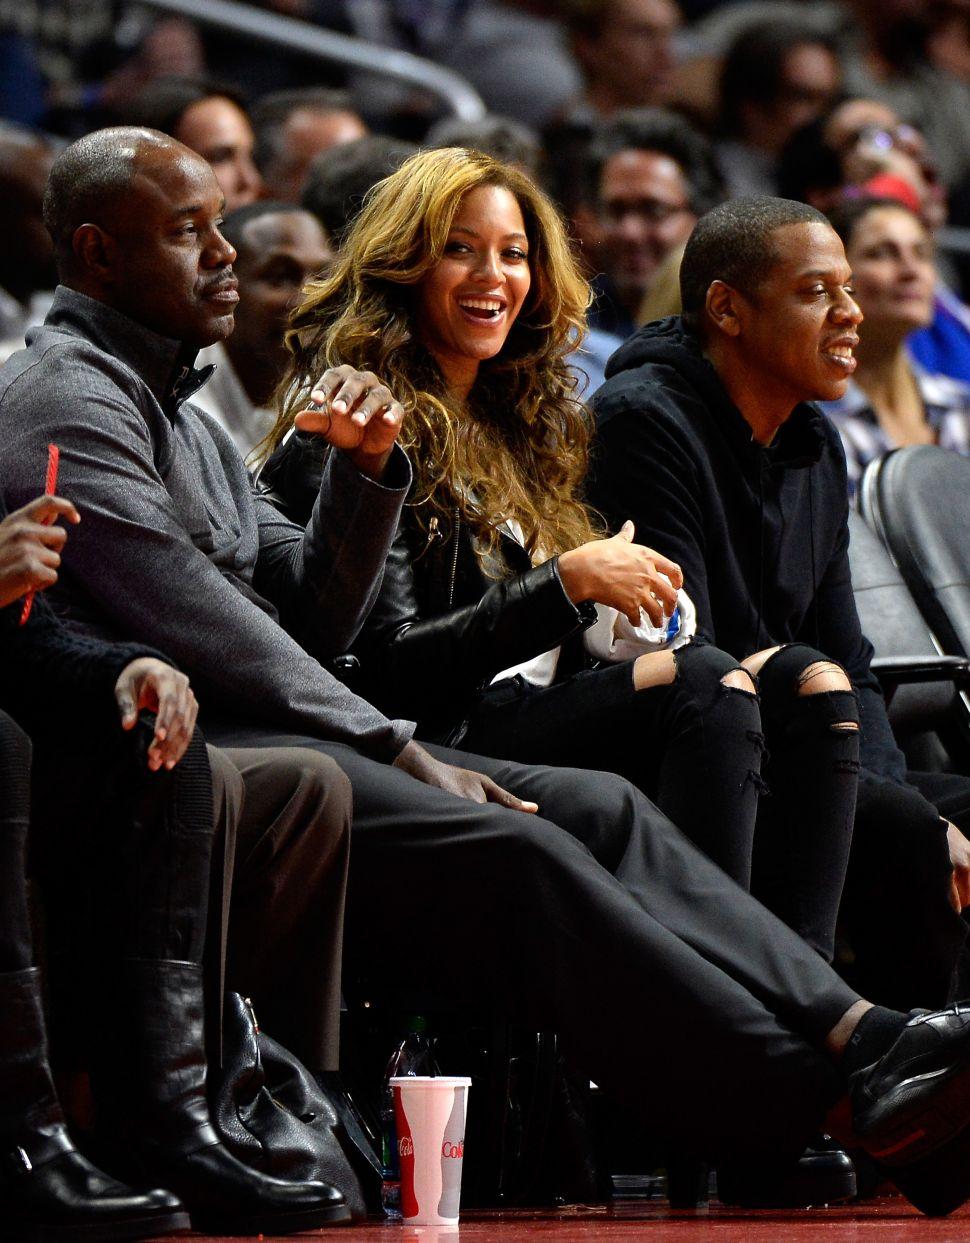 Beyoncé Is Starting a Mail-Order Gluten Free, Vegan Diet Company